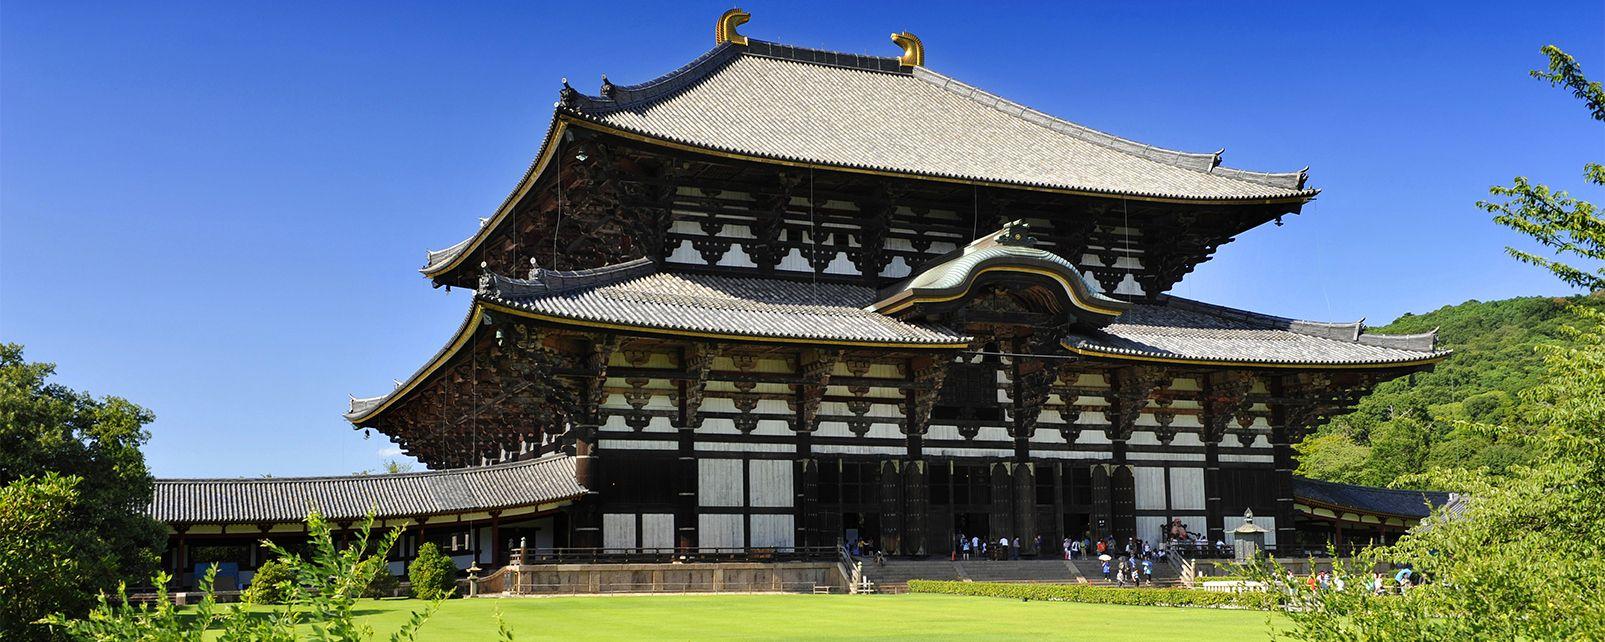 Todaiji, Nara , The Todai-ji in Nara , Japan